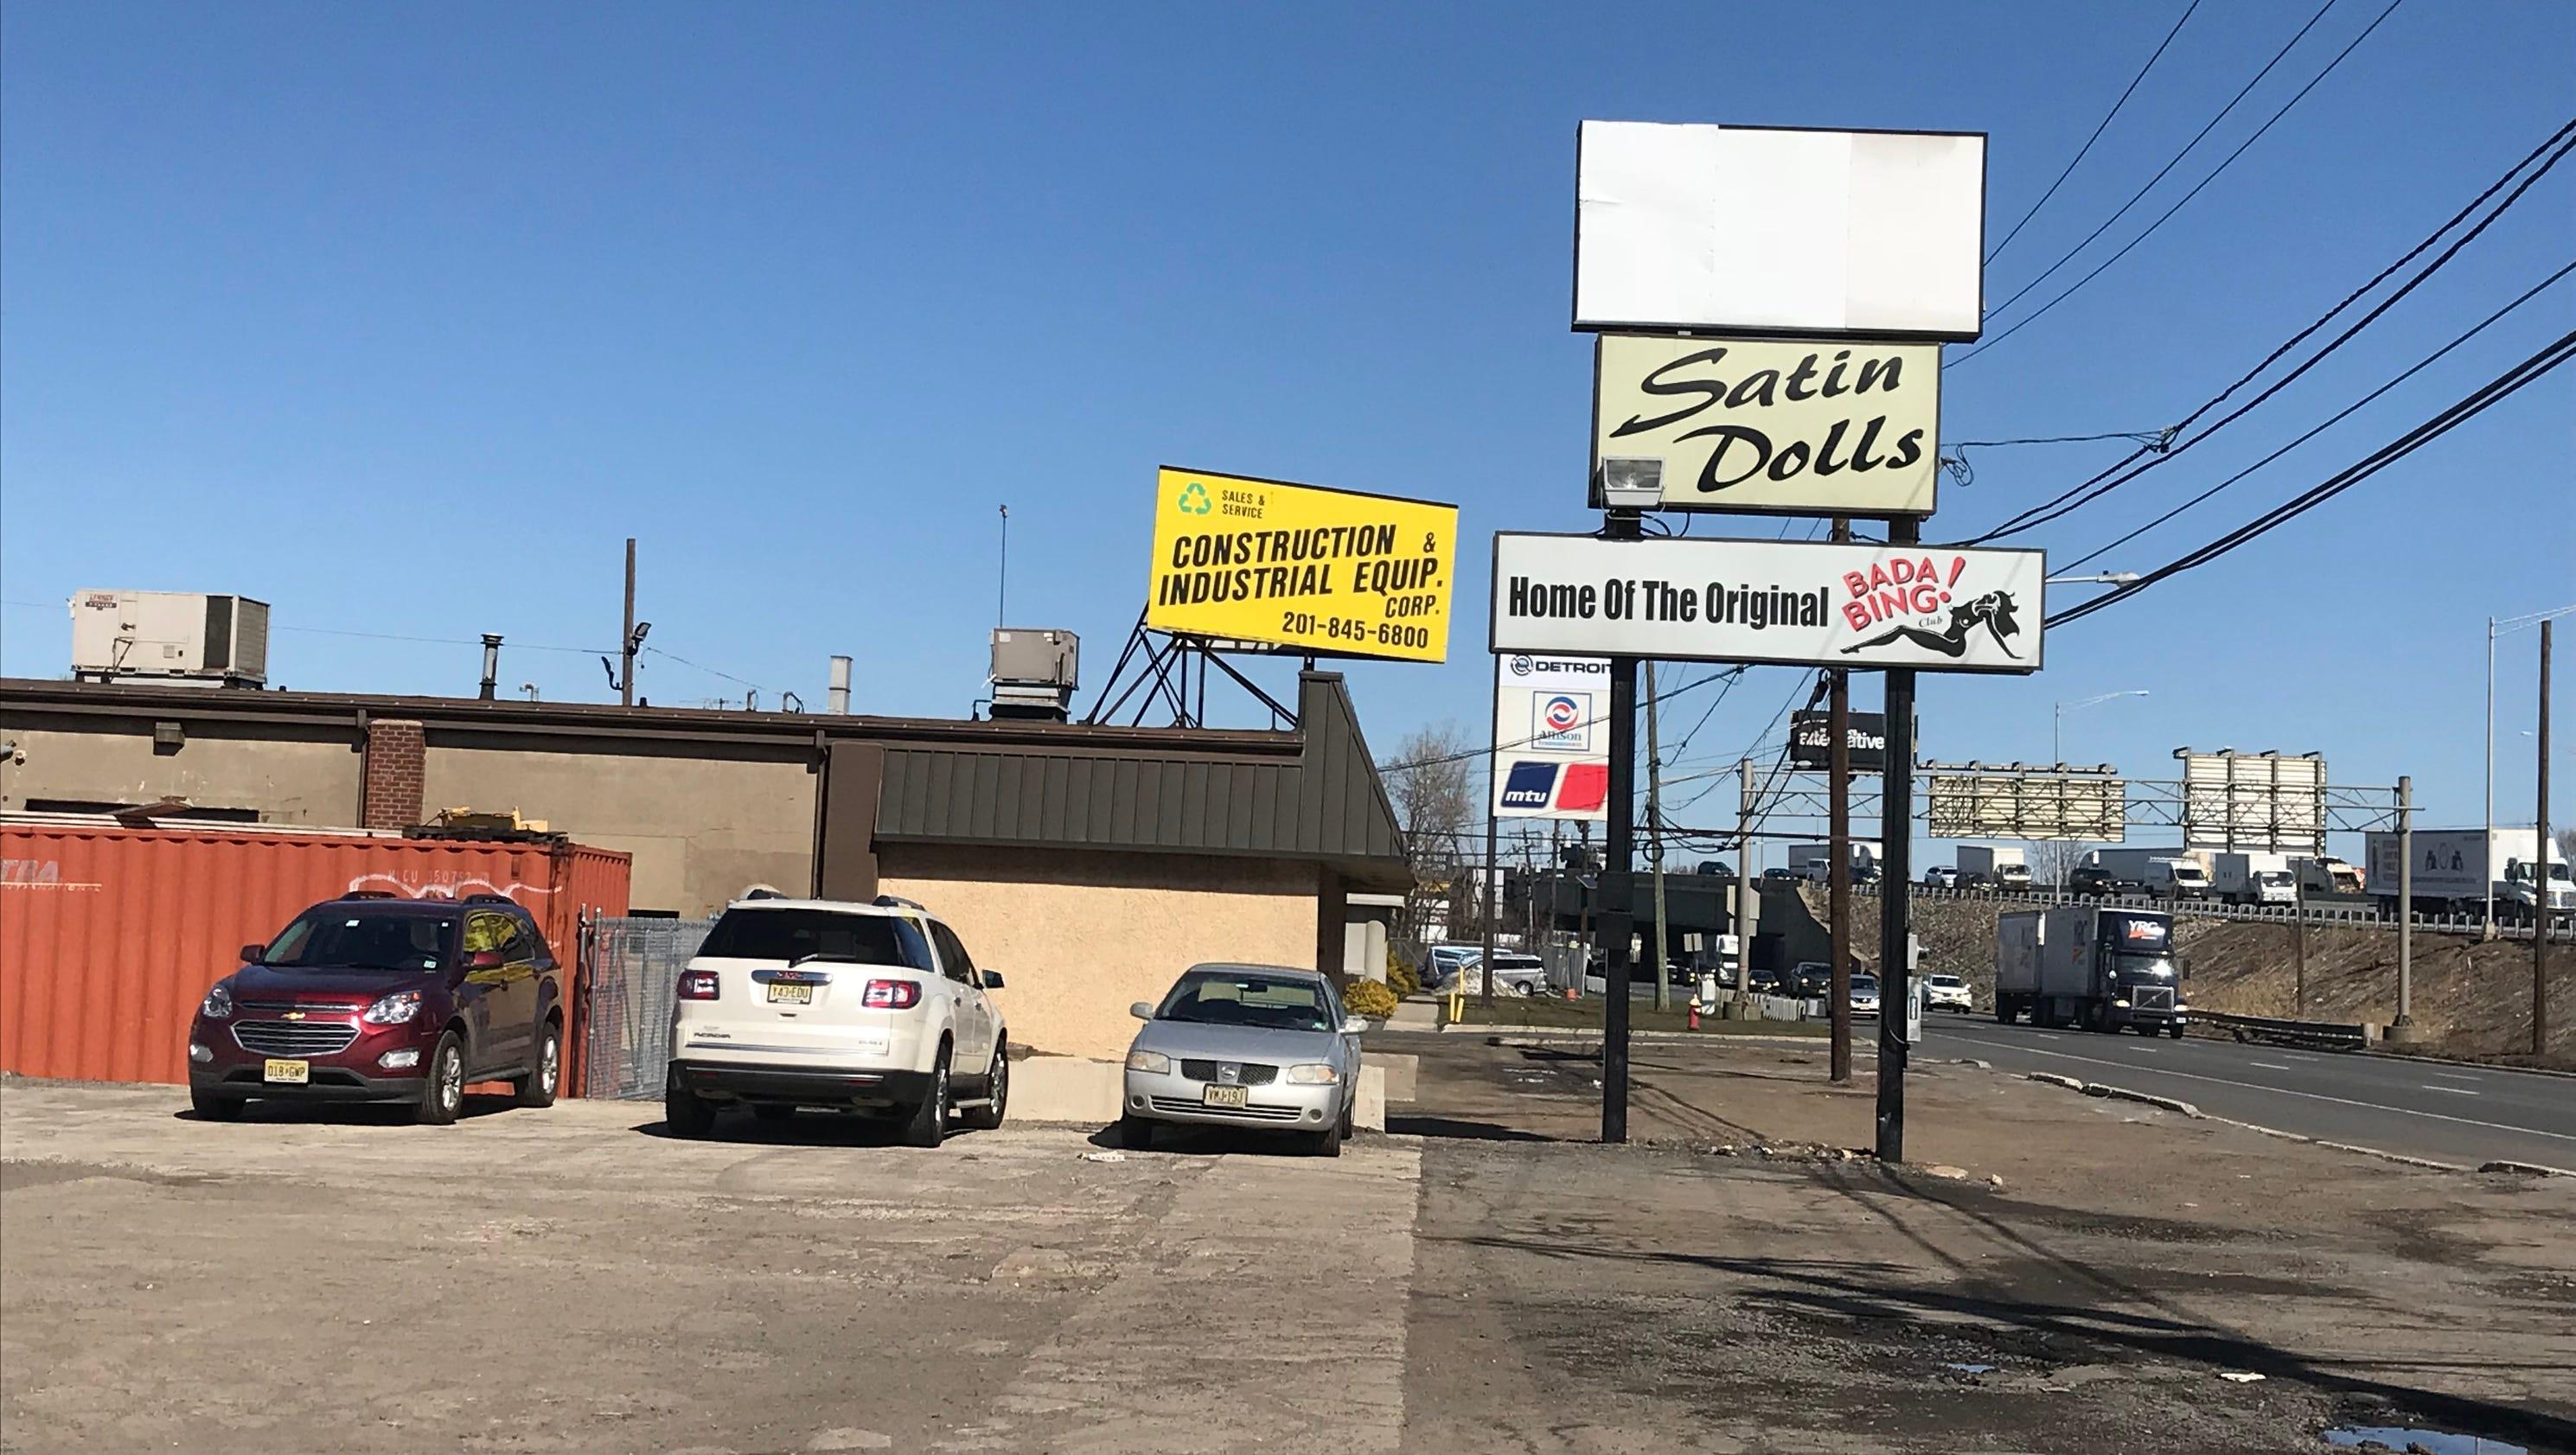 Satin Dolls NJ: Sopranos Bada Bing club is back in business